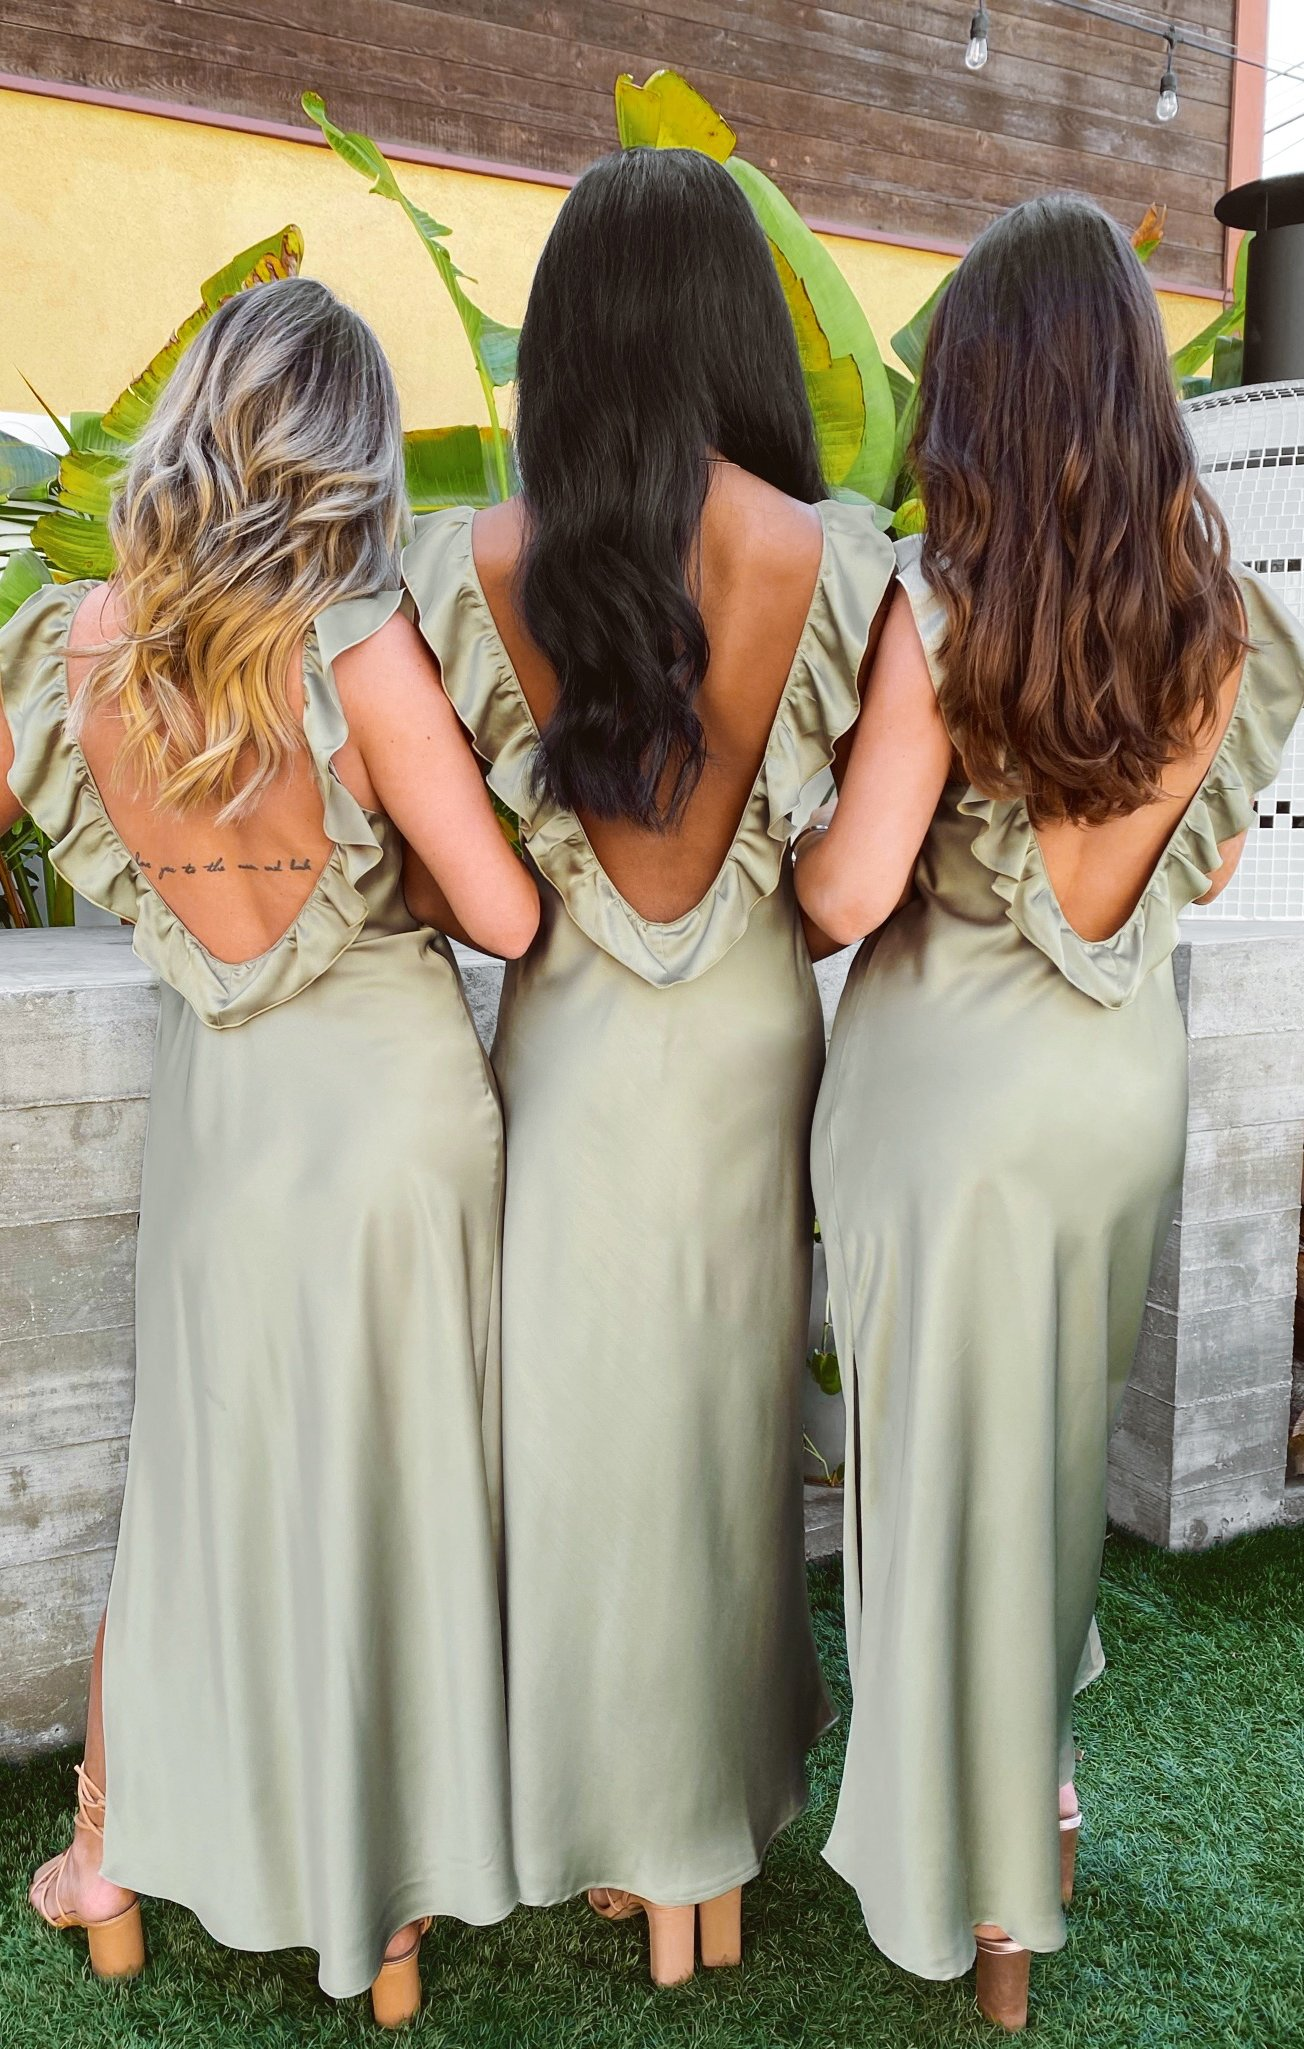 bridesmaid dresses, bridesmaid dress ideas, bridesmaid dress colors, bridesmaid dress styles, satin bridesmaid dress